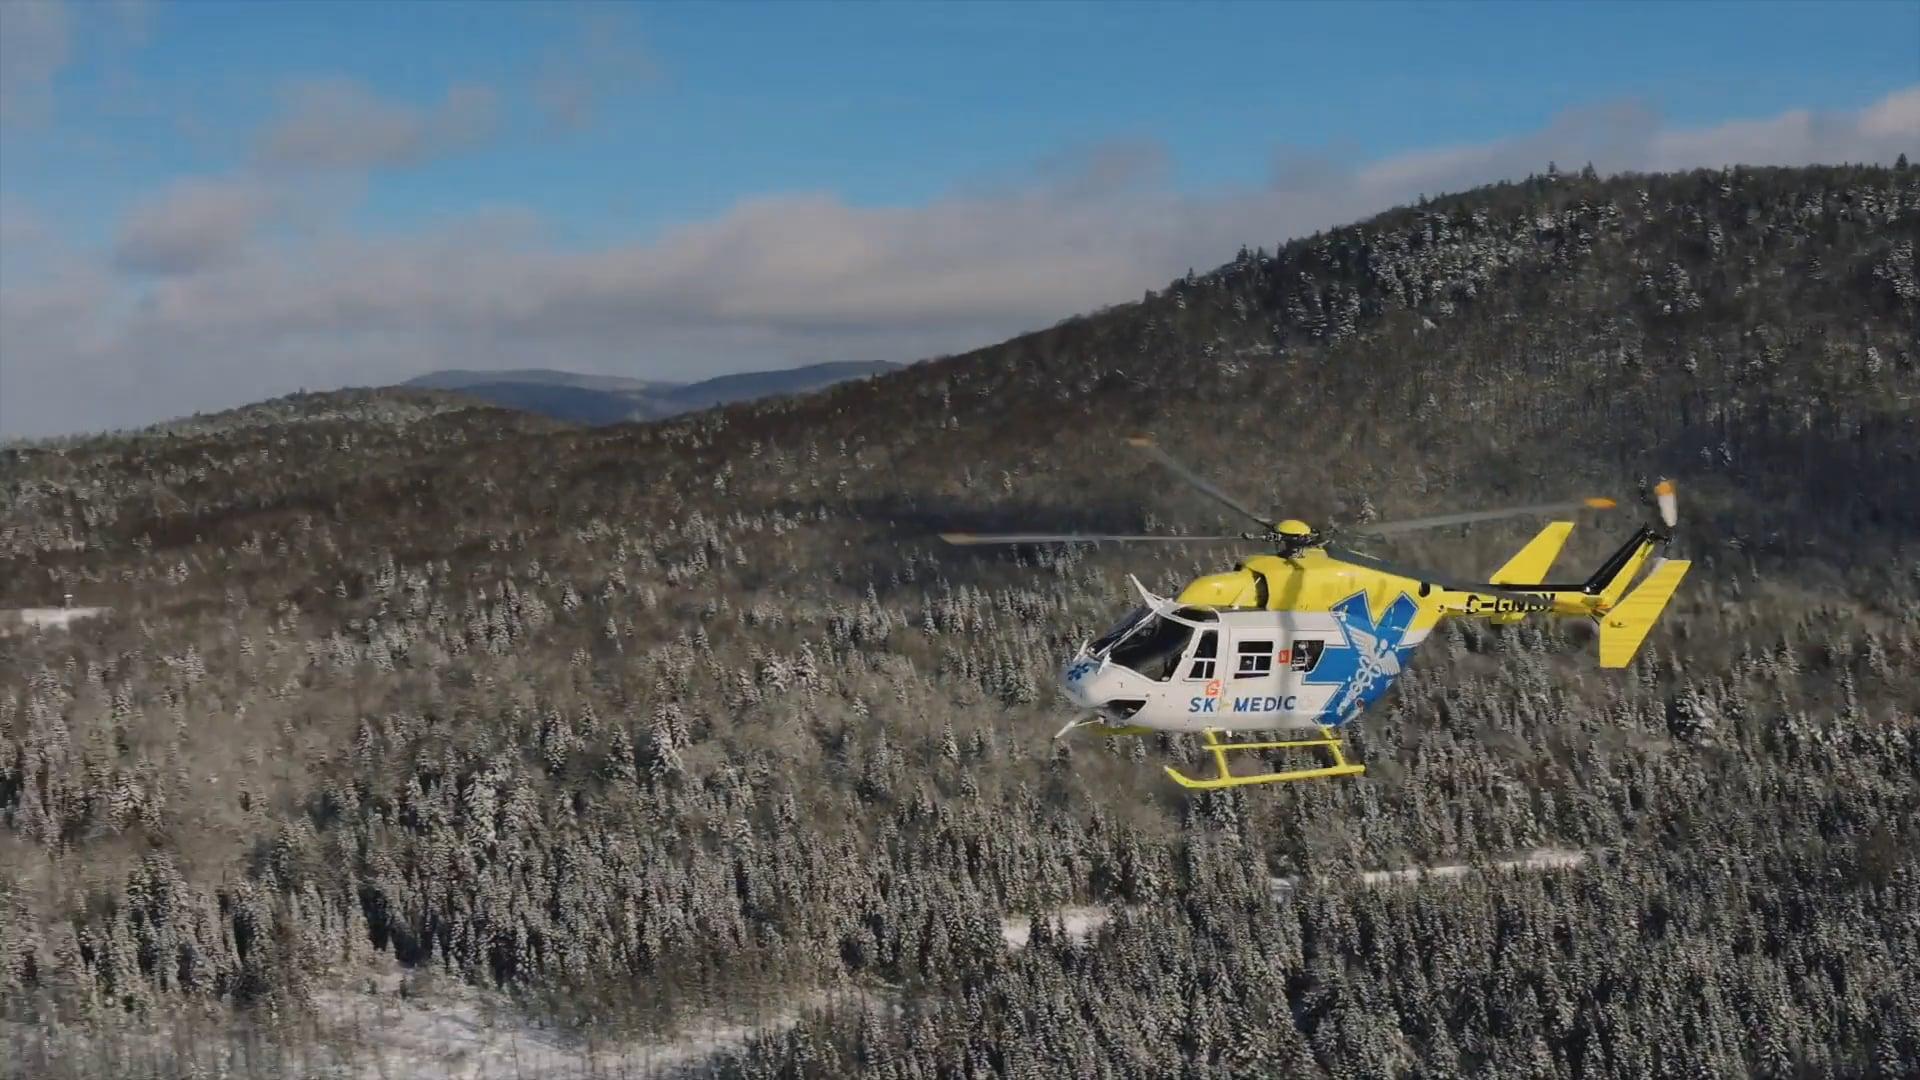 SKYMEDIC - Air ambulance